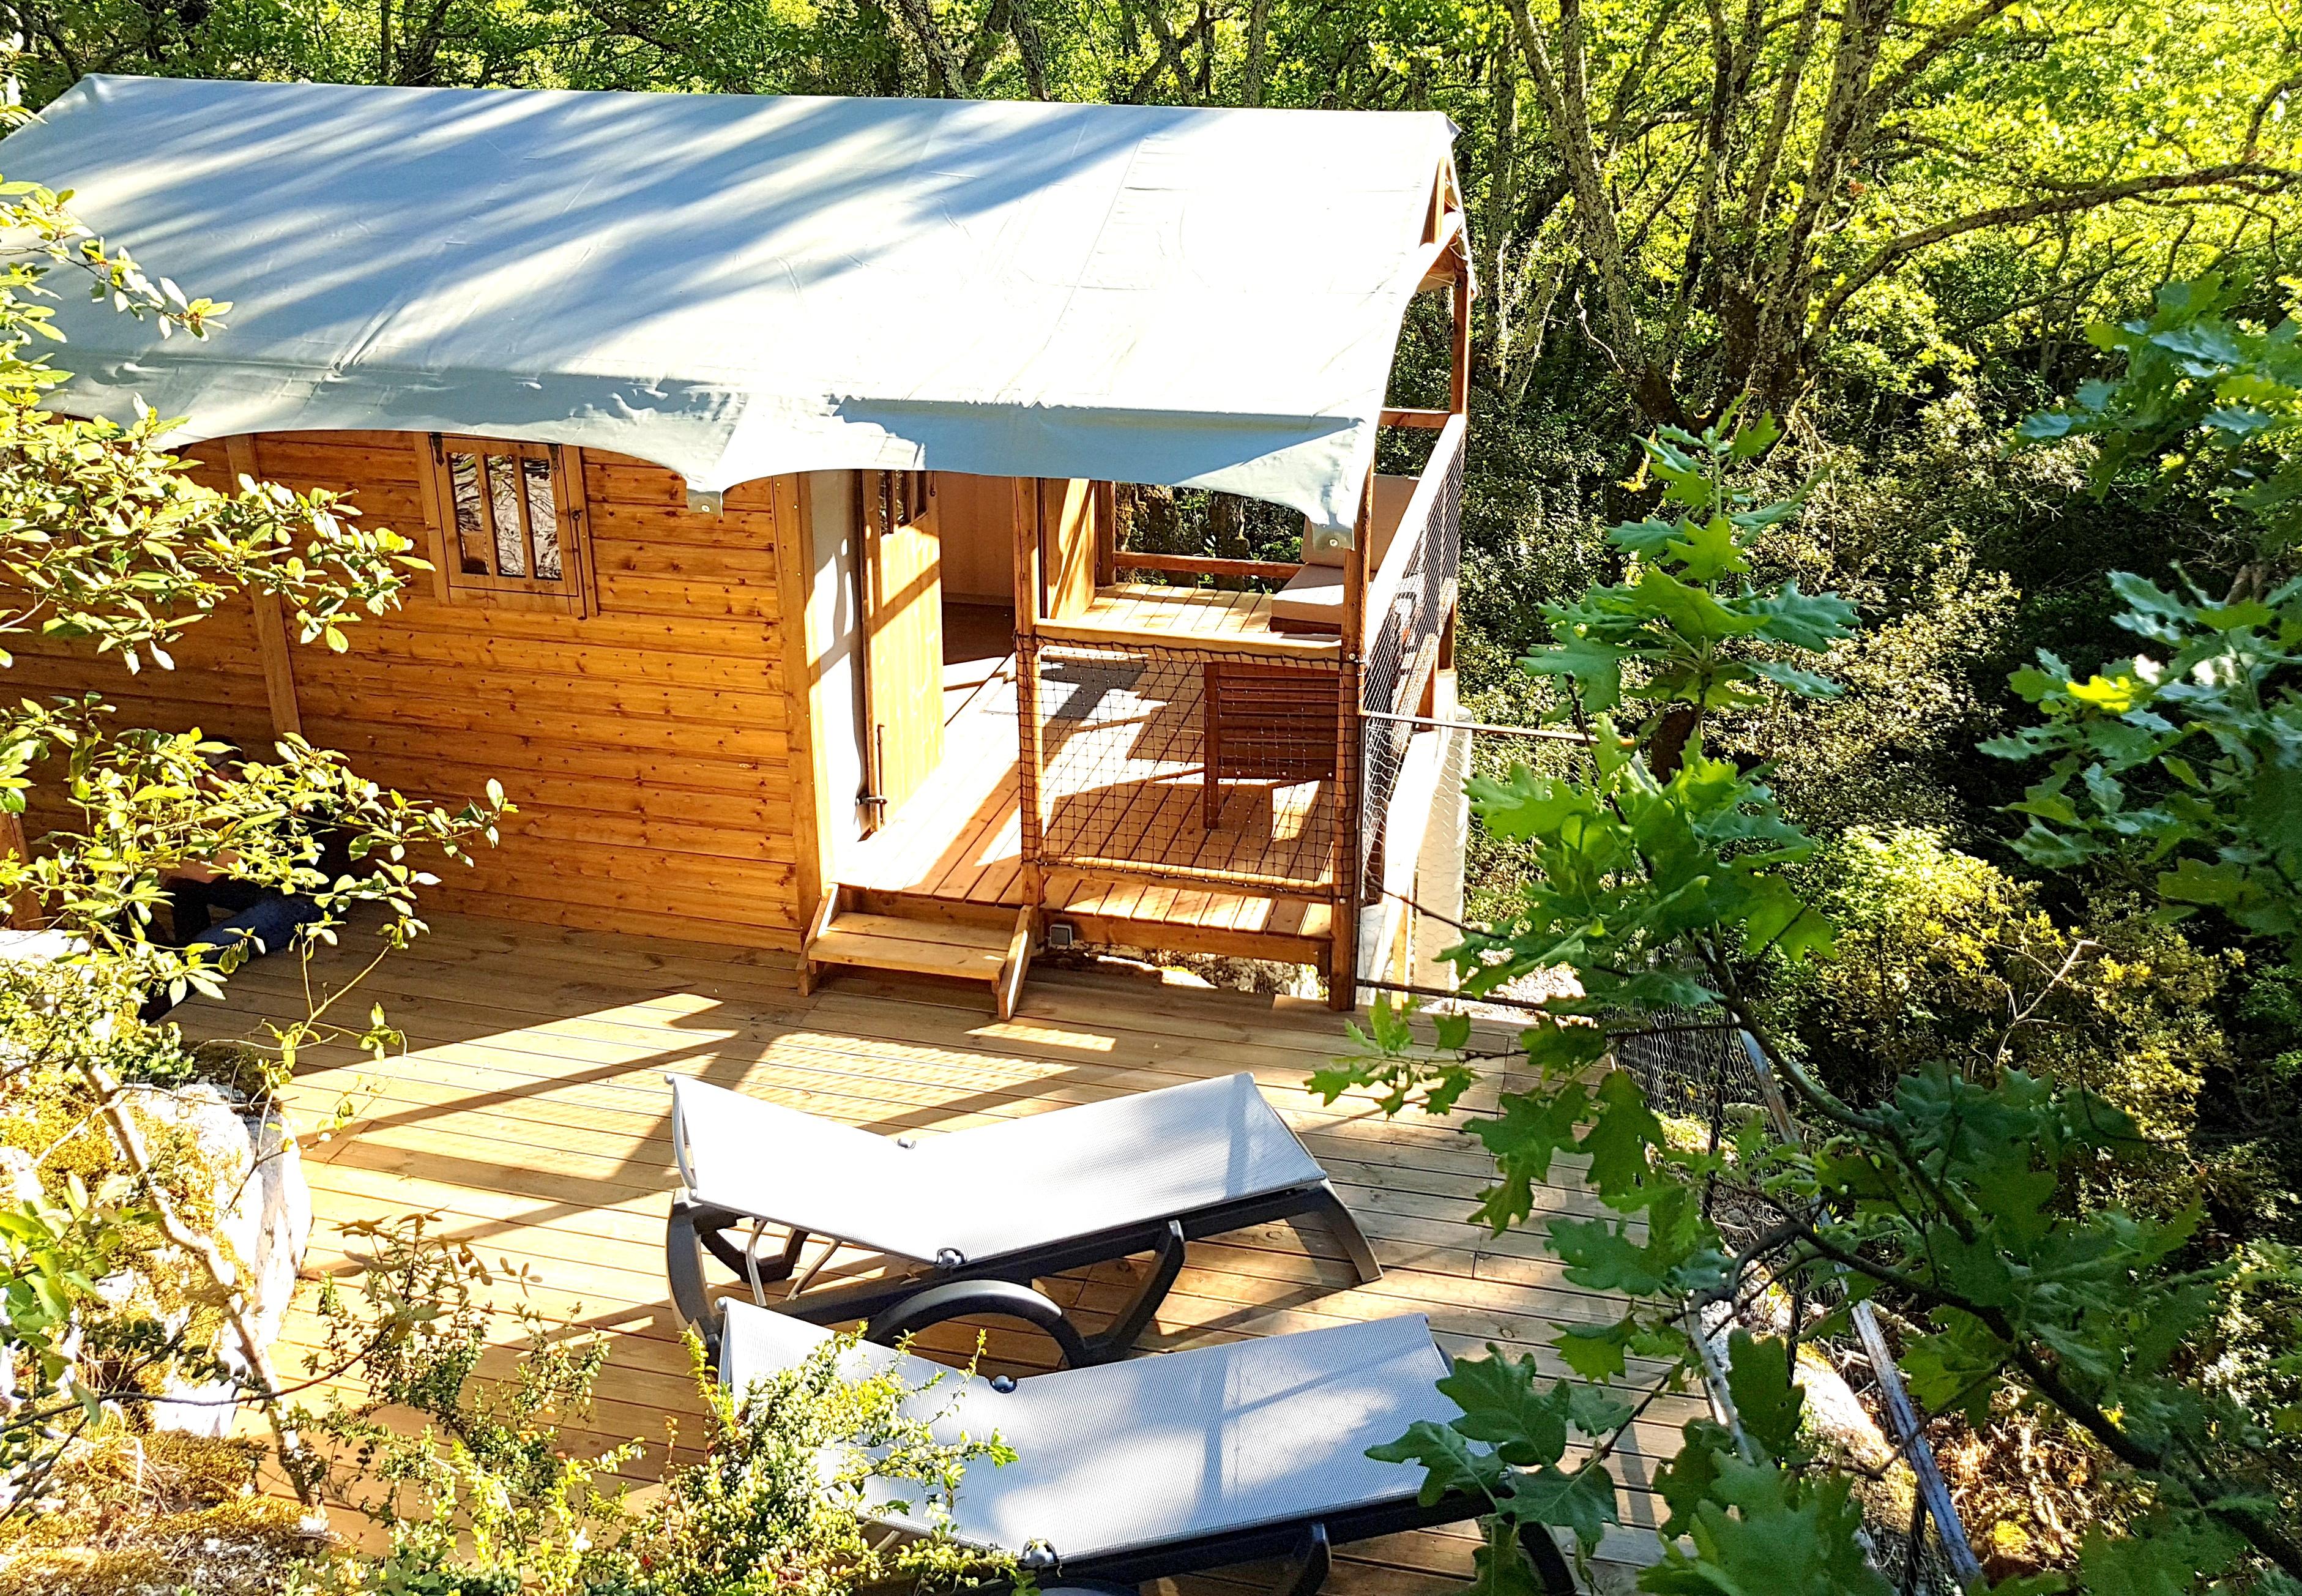 Cabane-Lodge Le Vallon